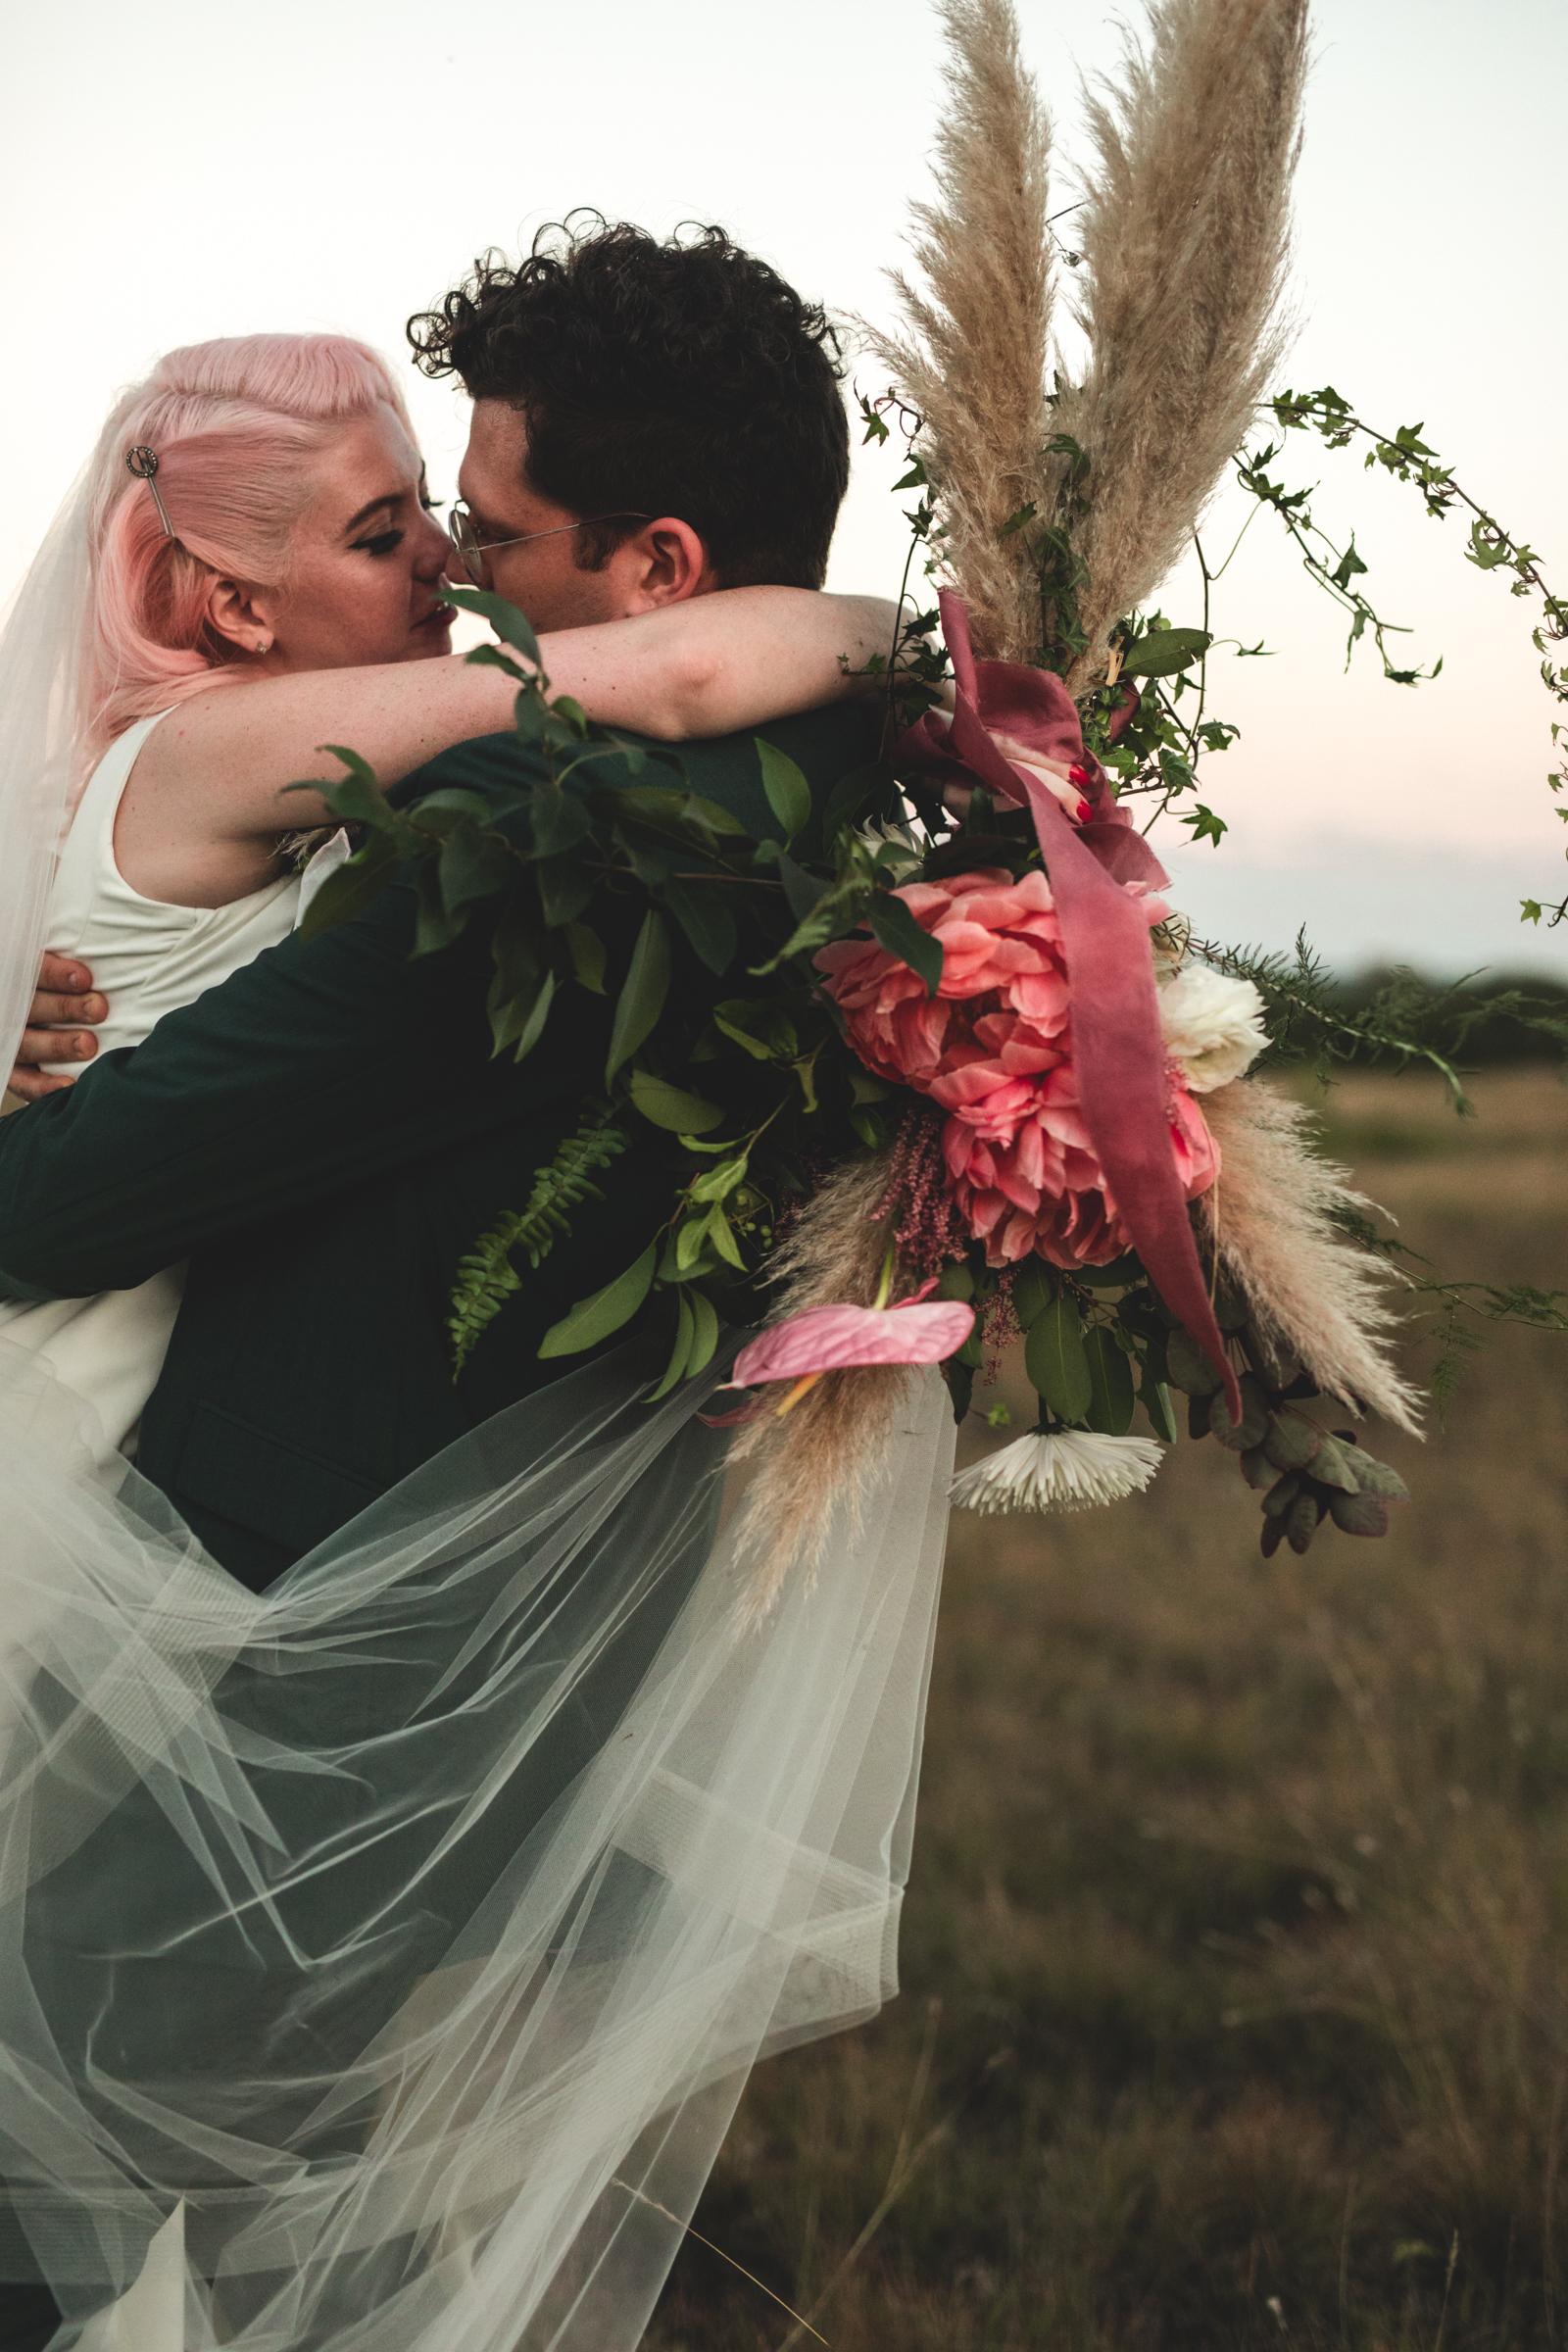 Caroline and Logan, Married - 20171021-16510232.JPG